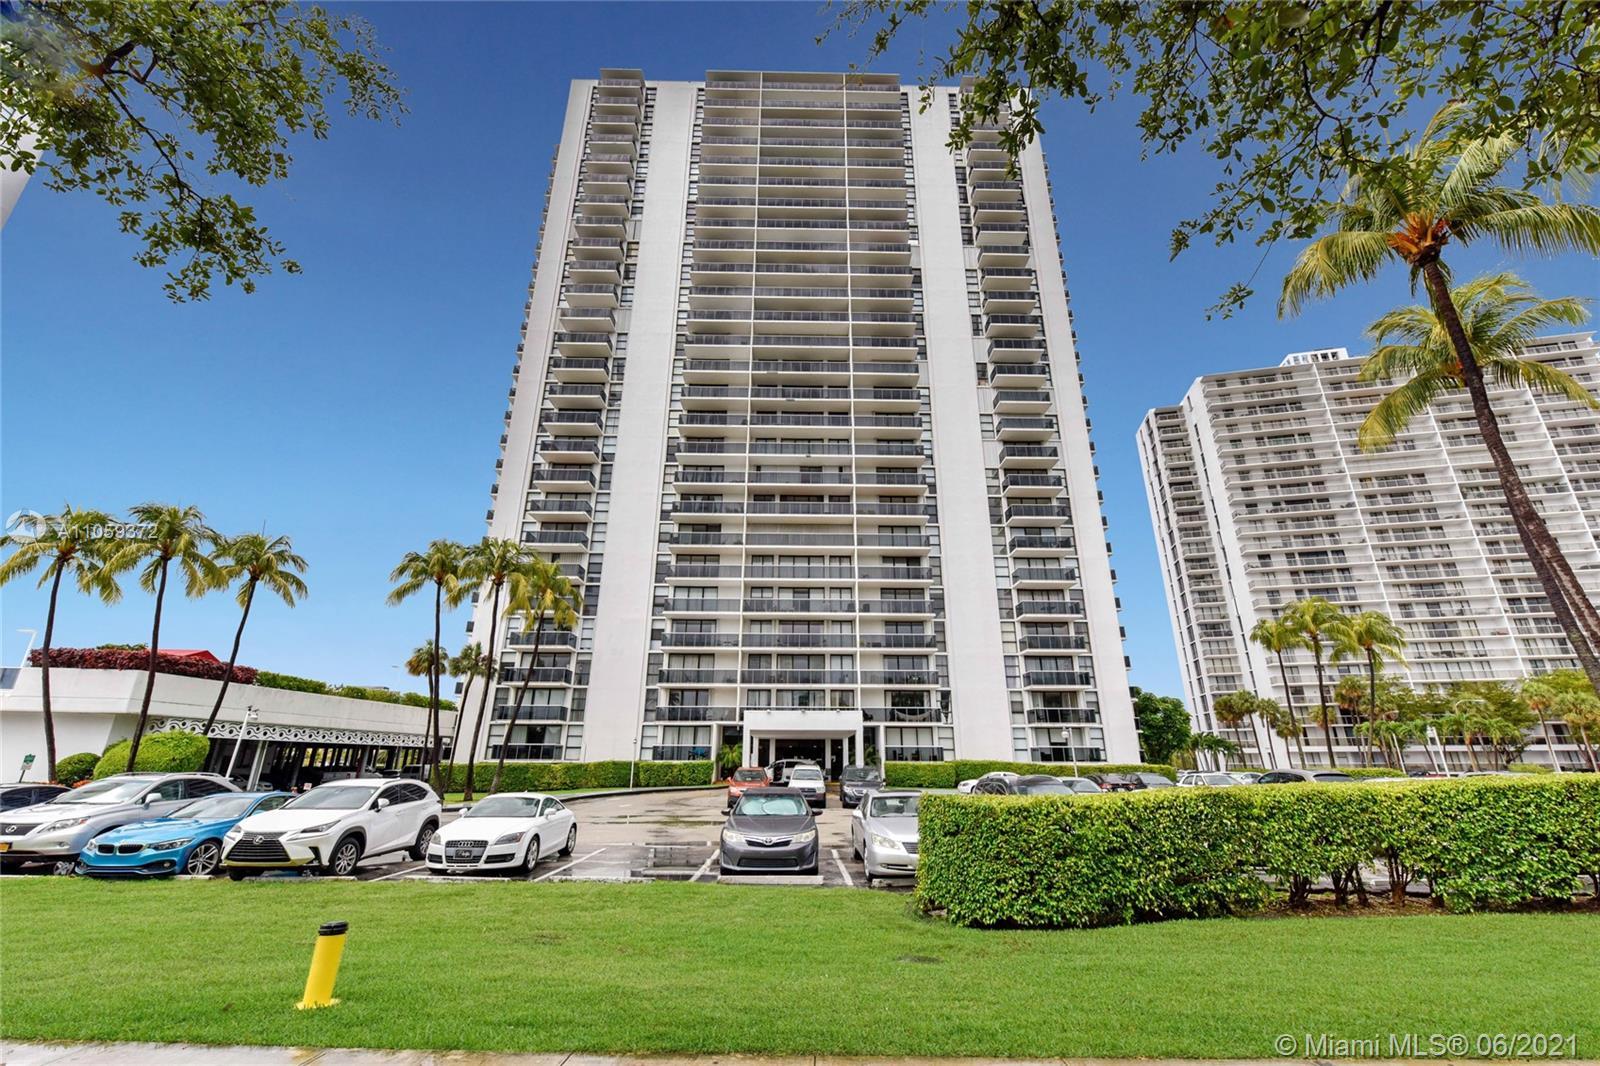 Eldorado Tower Two #709 - 3675 N Country Club Dr #709, Aventura, FL 33180